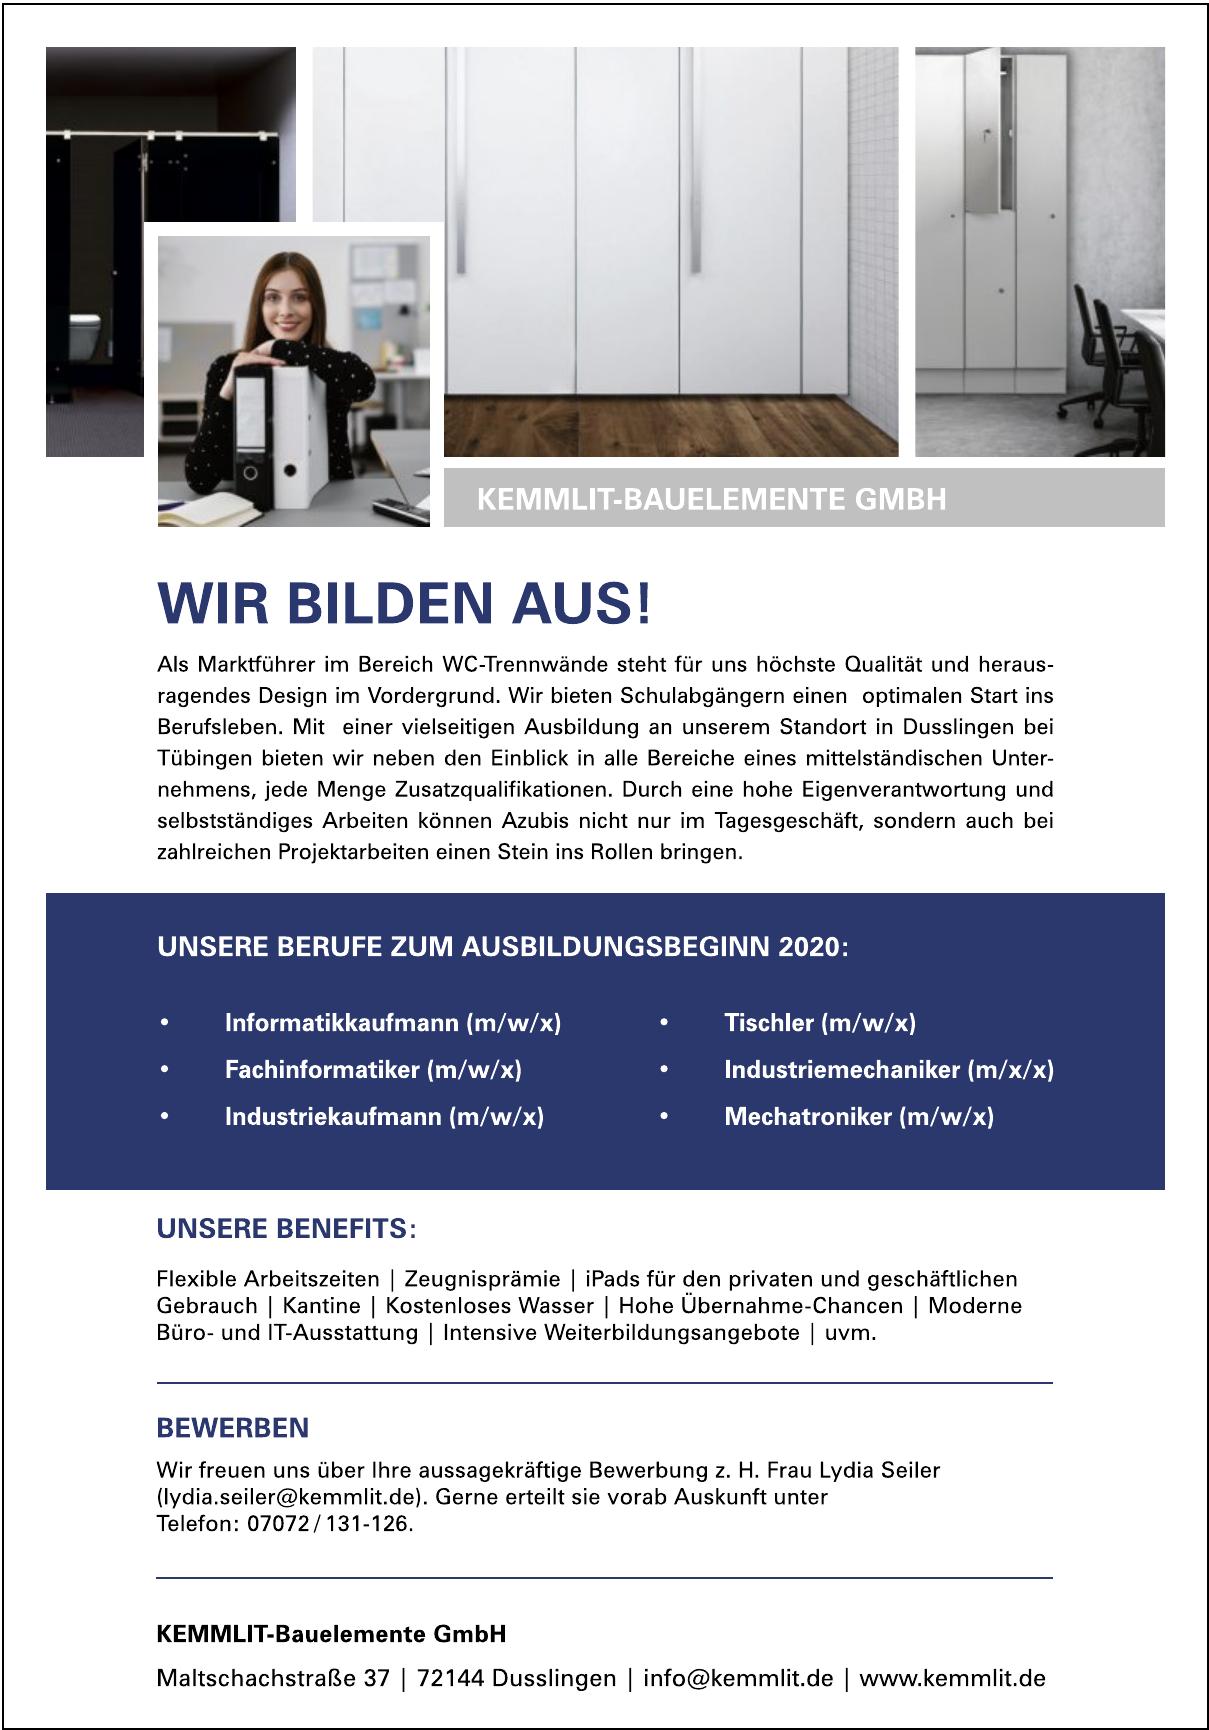 Kemmlit-Bauelemente GmbH